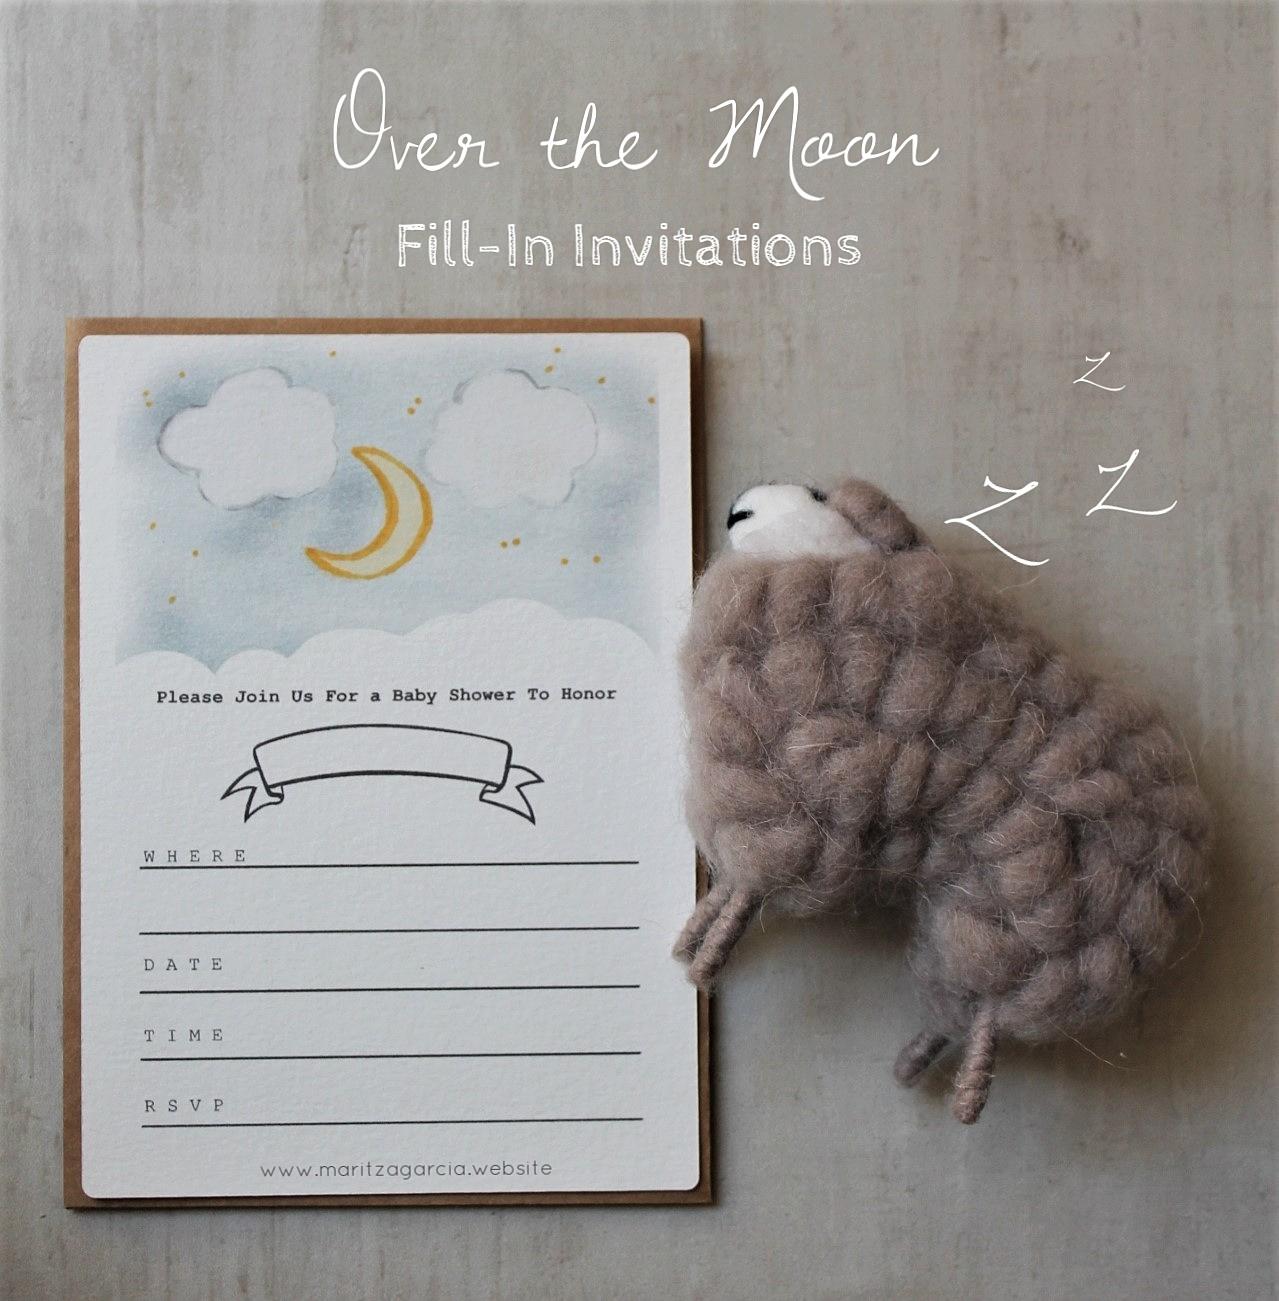 Over the Moon Fill-In Invitations by Maritza Garcia | www.maritzagarcia.website